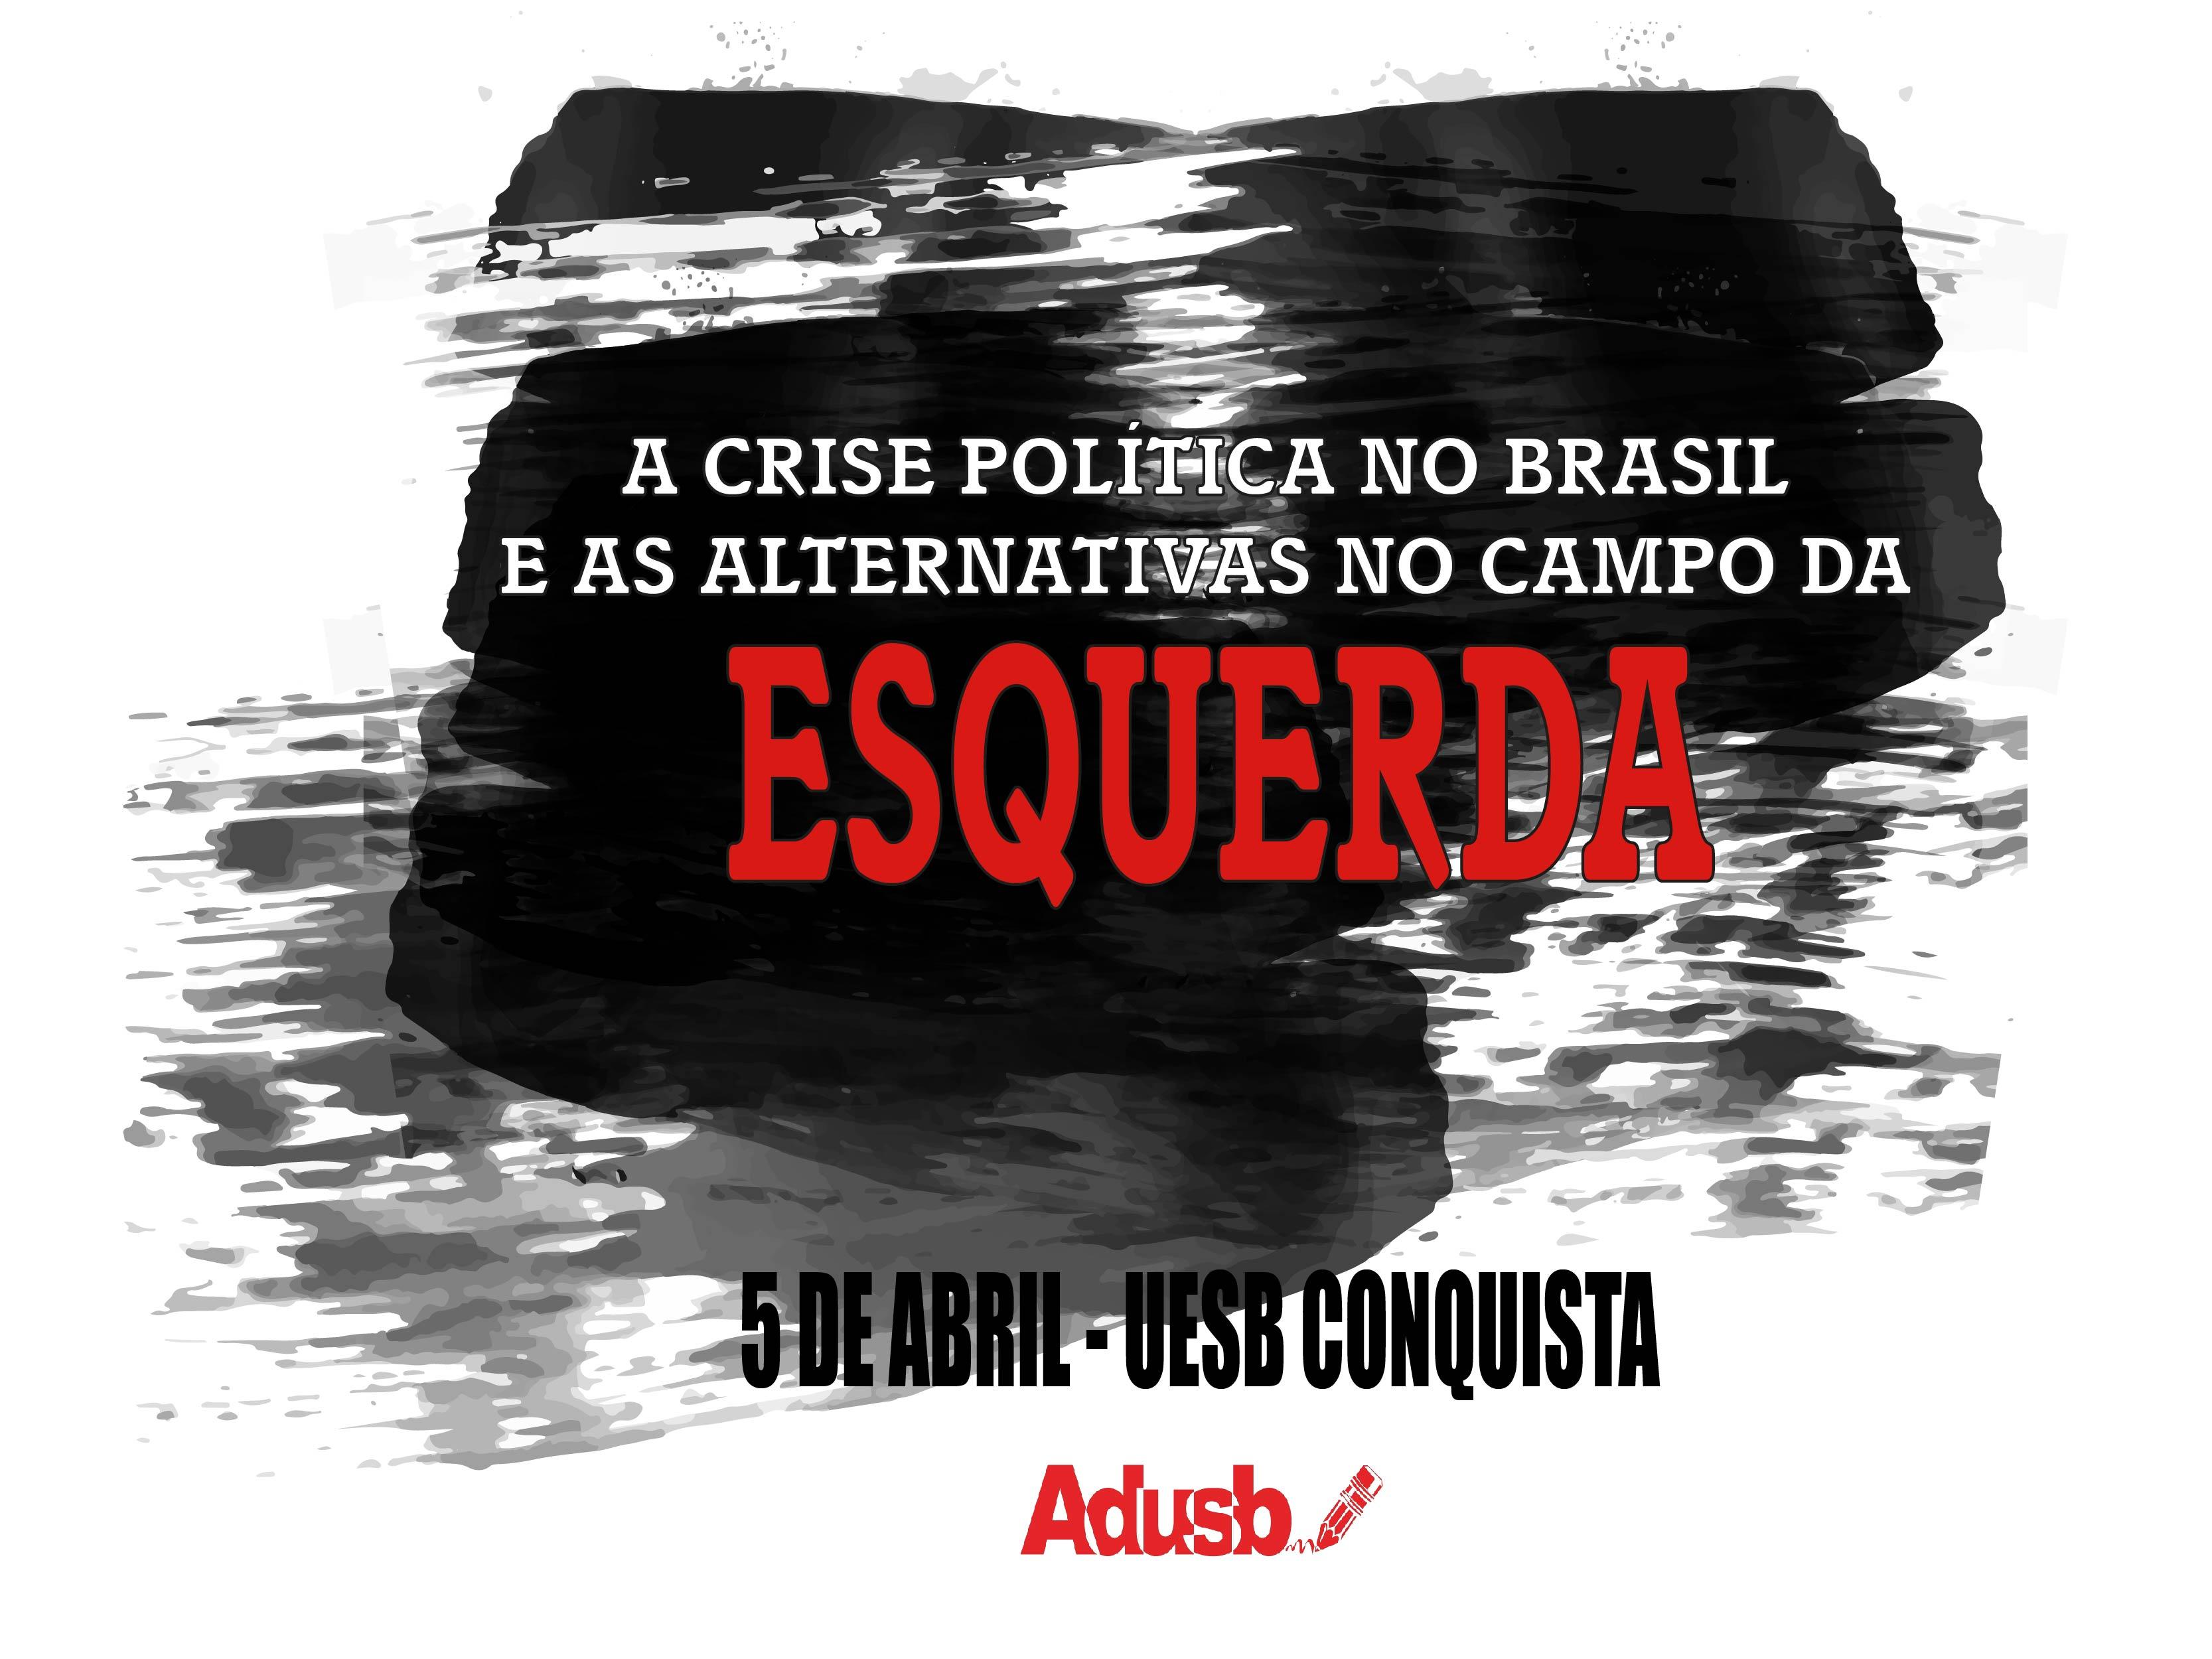 Adusb promove debate sobre crise política no Brasil no dia 5 de abril